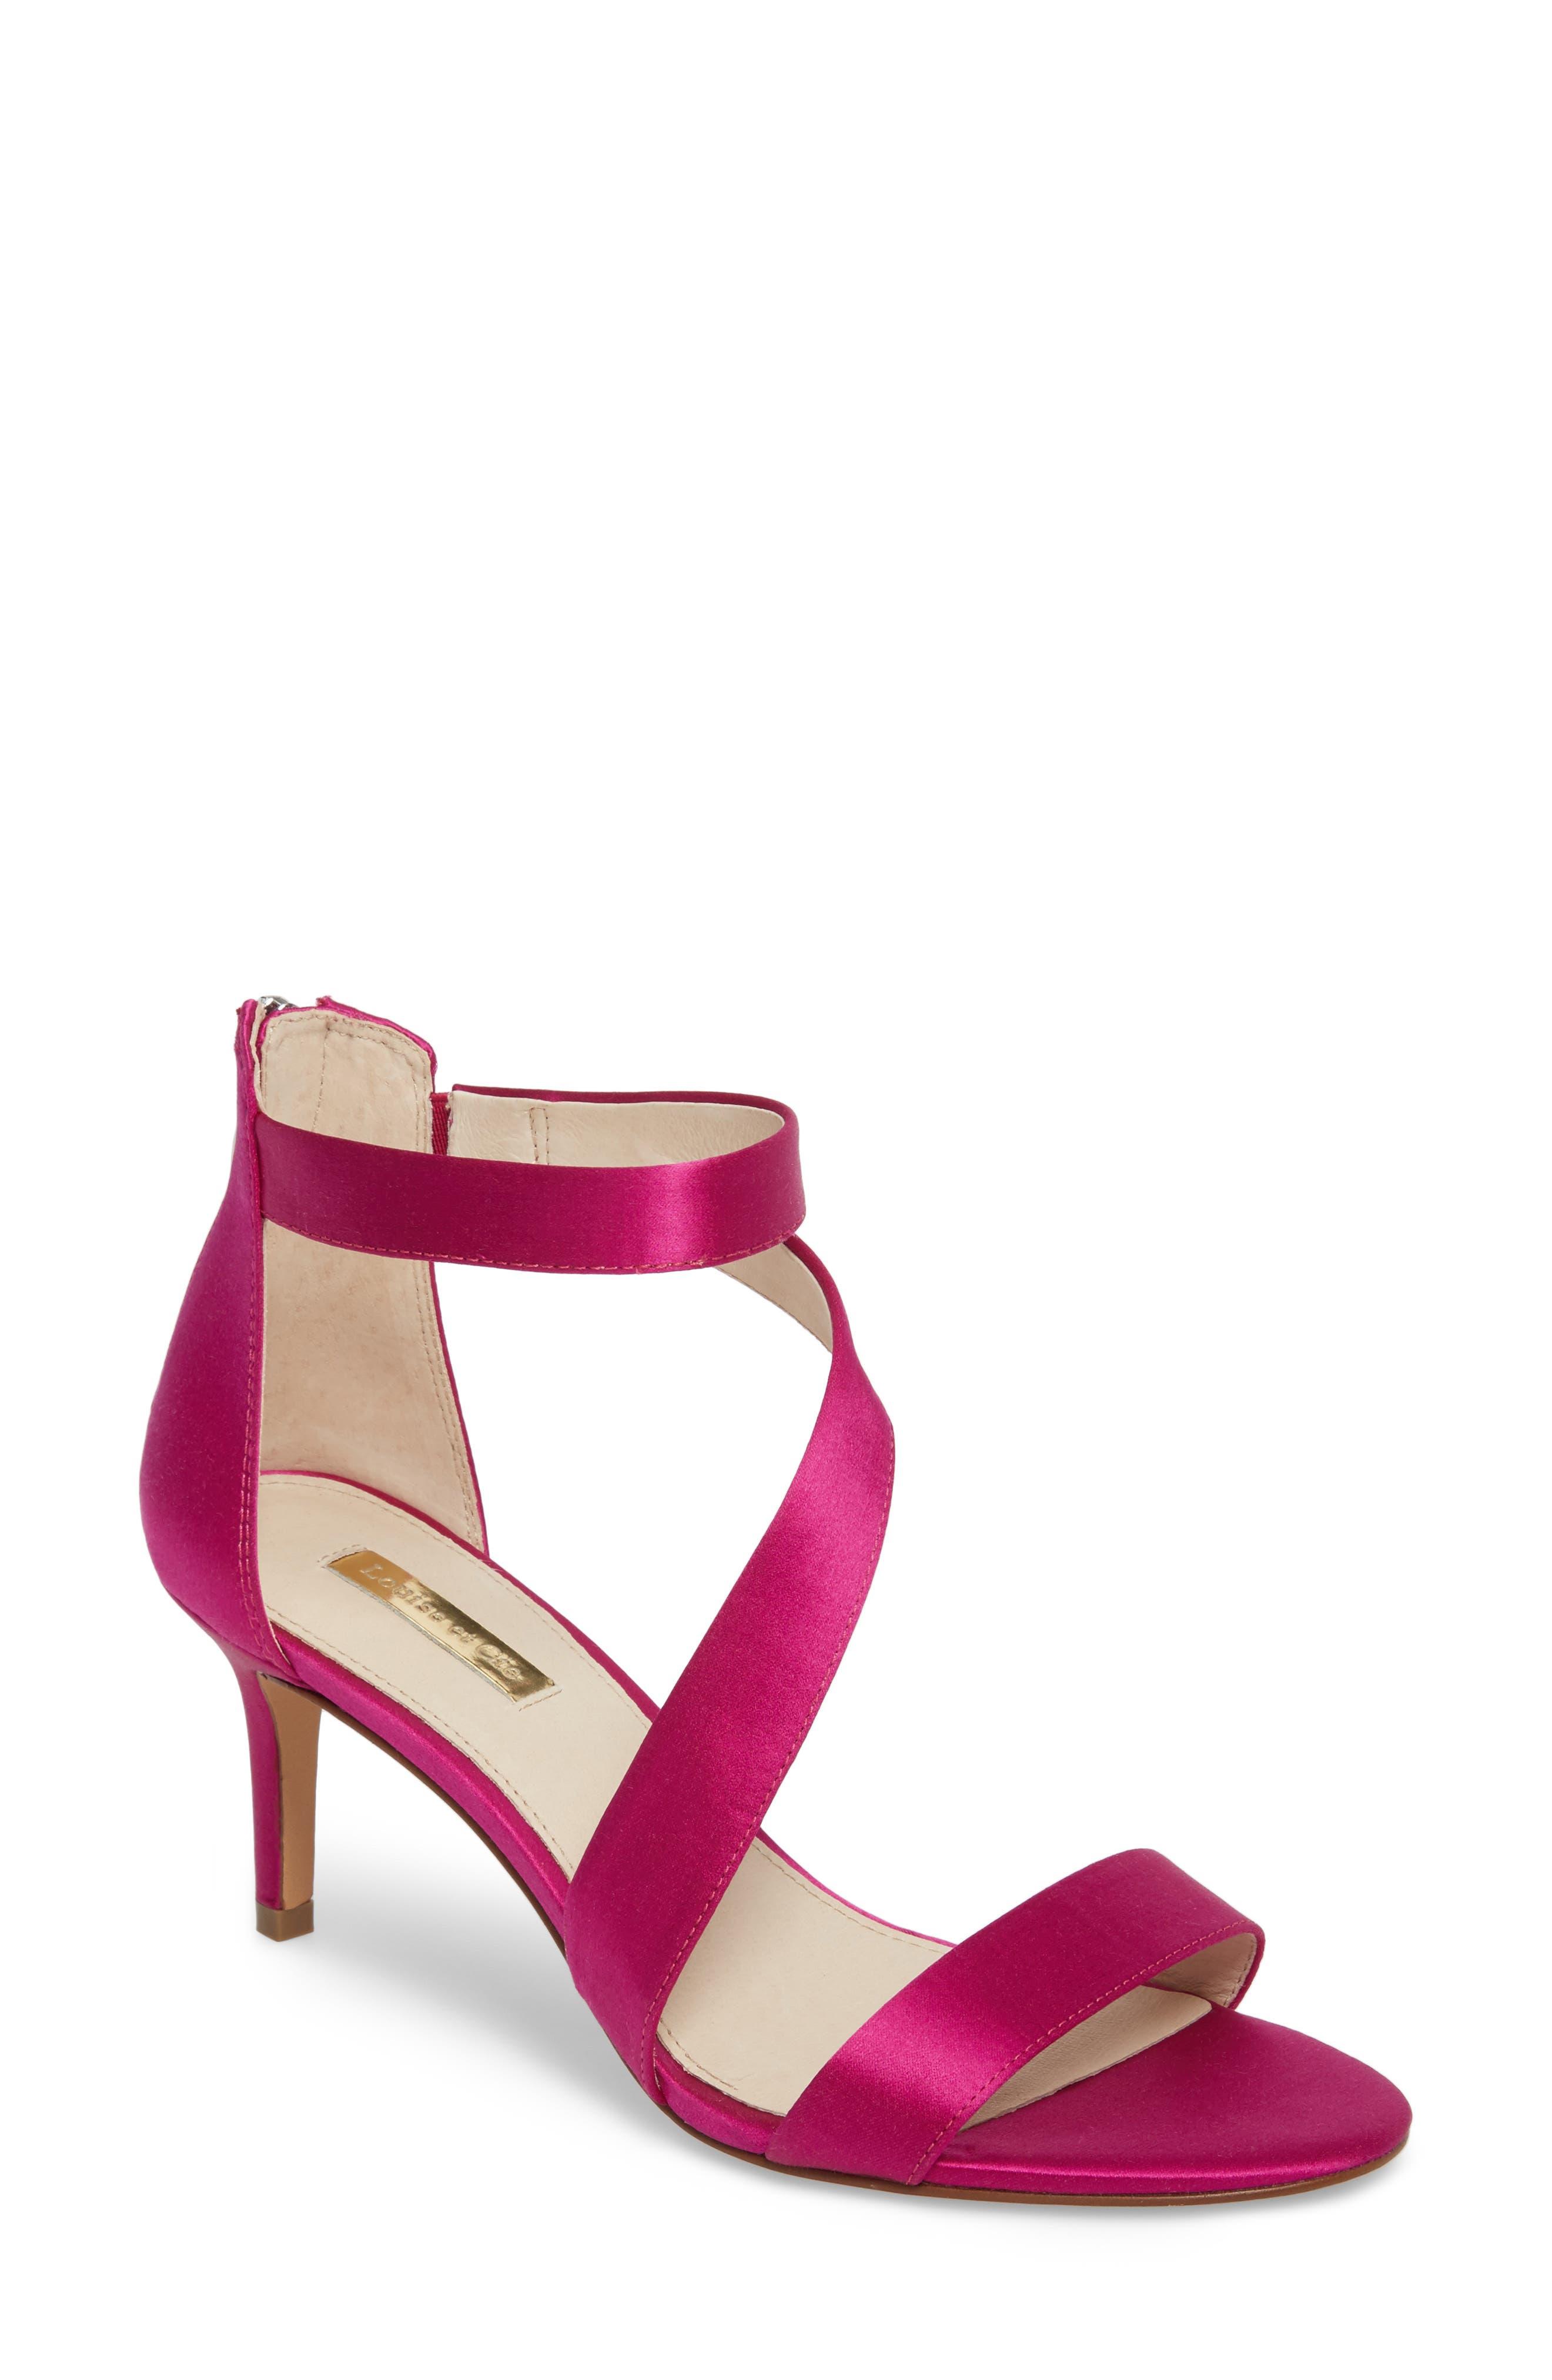 Hilio Sandal,                         Main,                         color, Electric Pink Satin